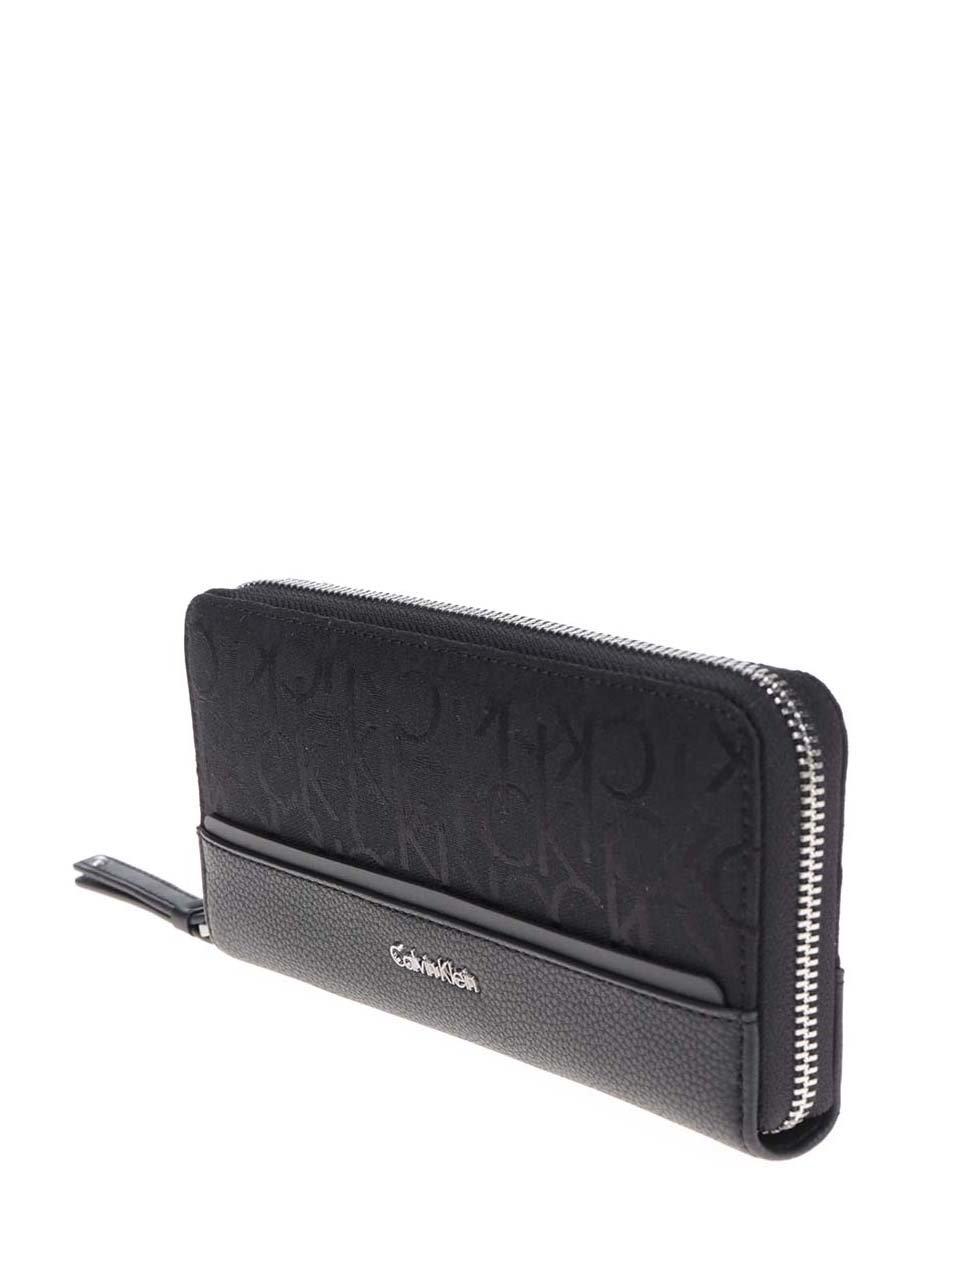 1a9dad4631 Čierna dámska peňaženka na zips Calvin Klein Jeans Marina ...